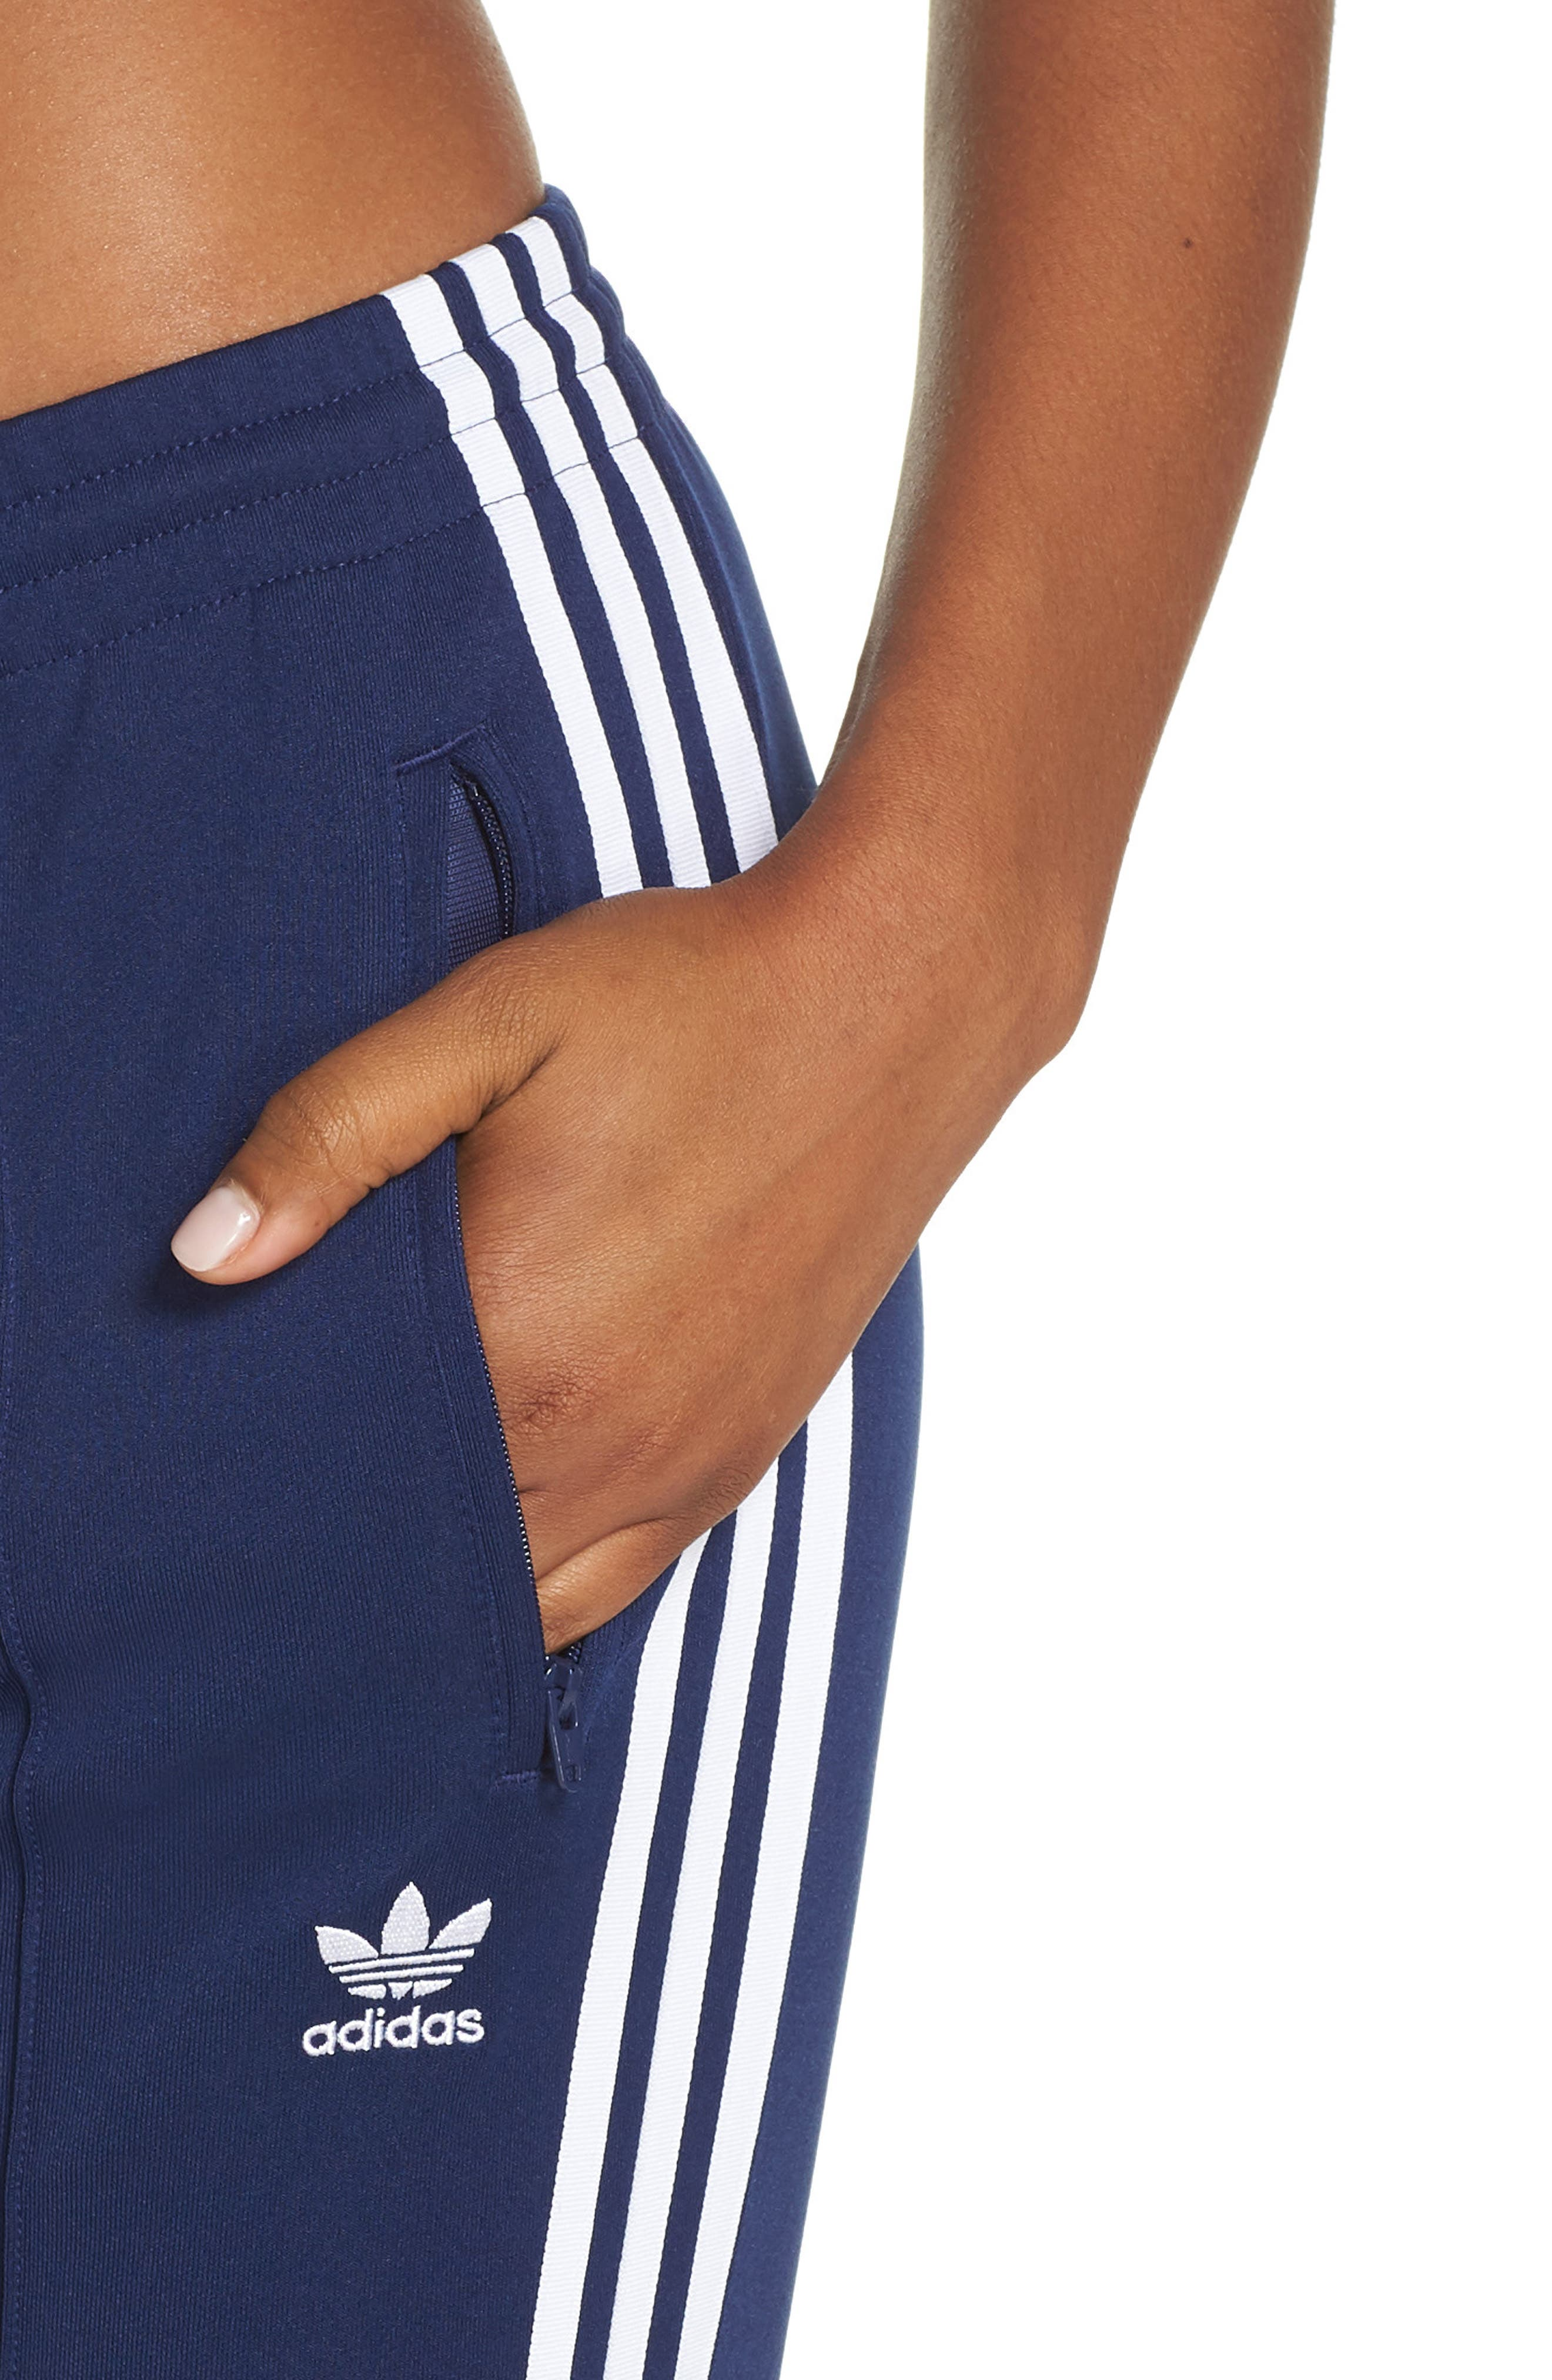 SST Track Pants,                             Alternate thumbnail 4, color,                             DARK BLUE